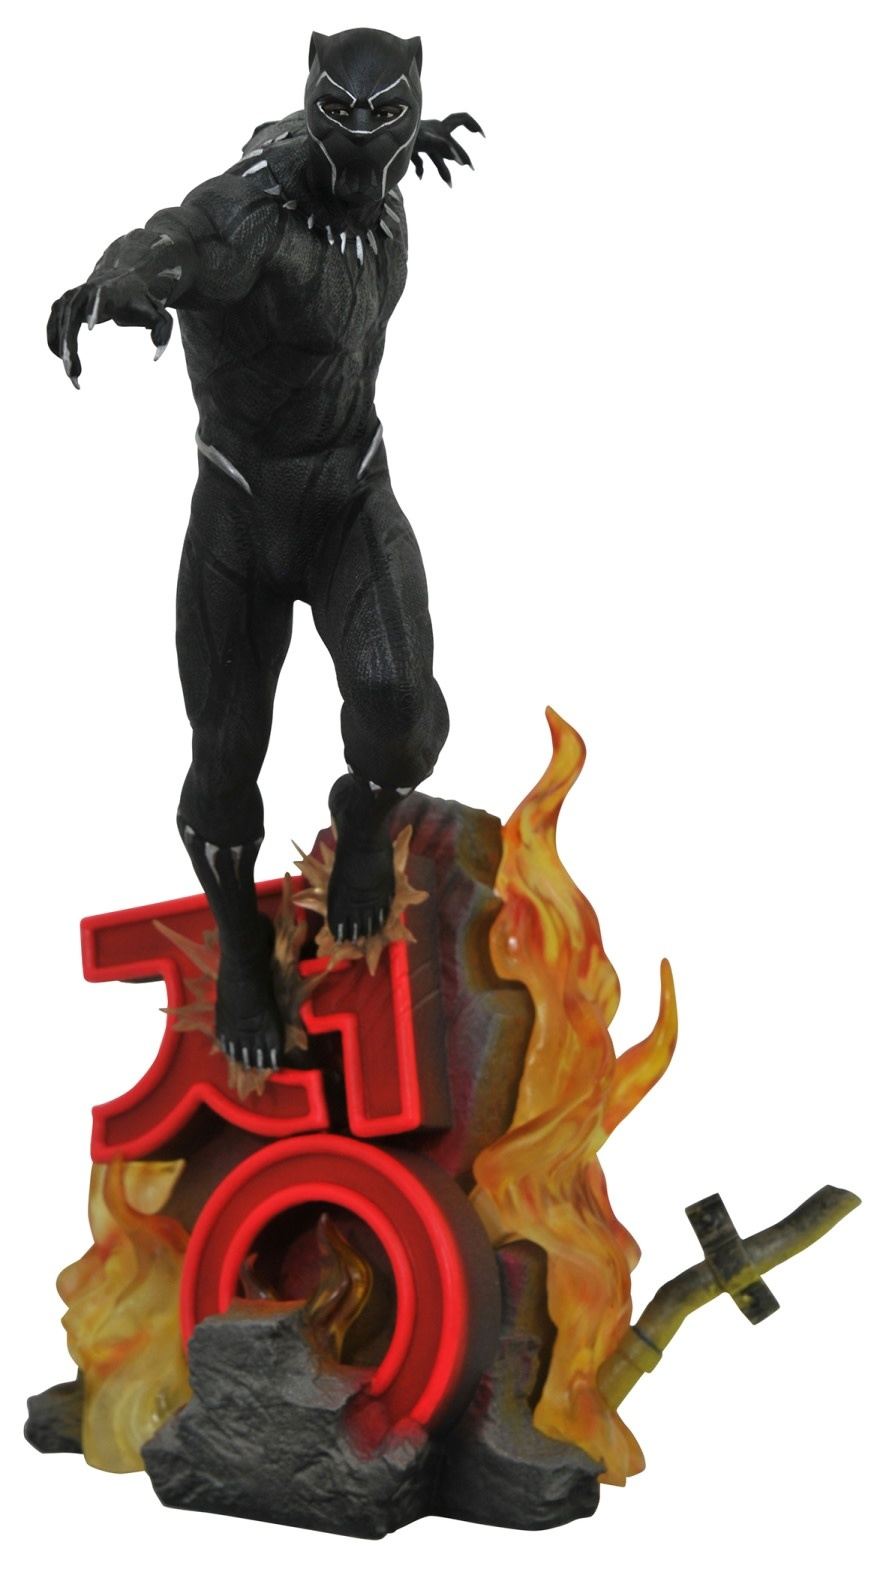 Diamond Direct Marvel Premier: Black Panther Movie Statue